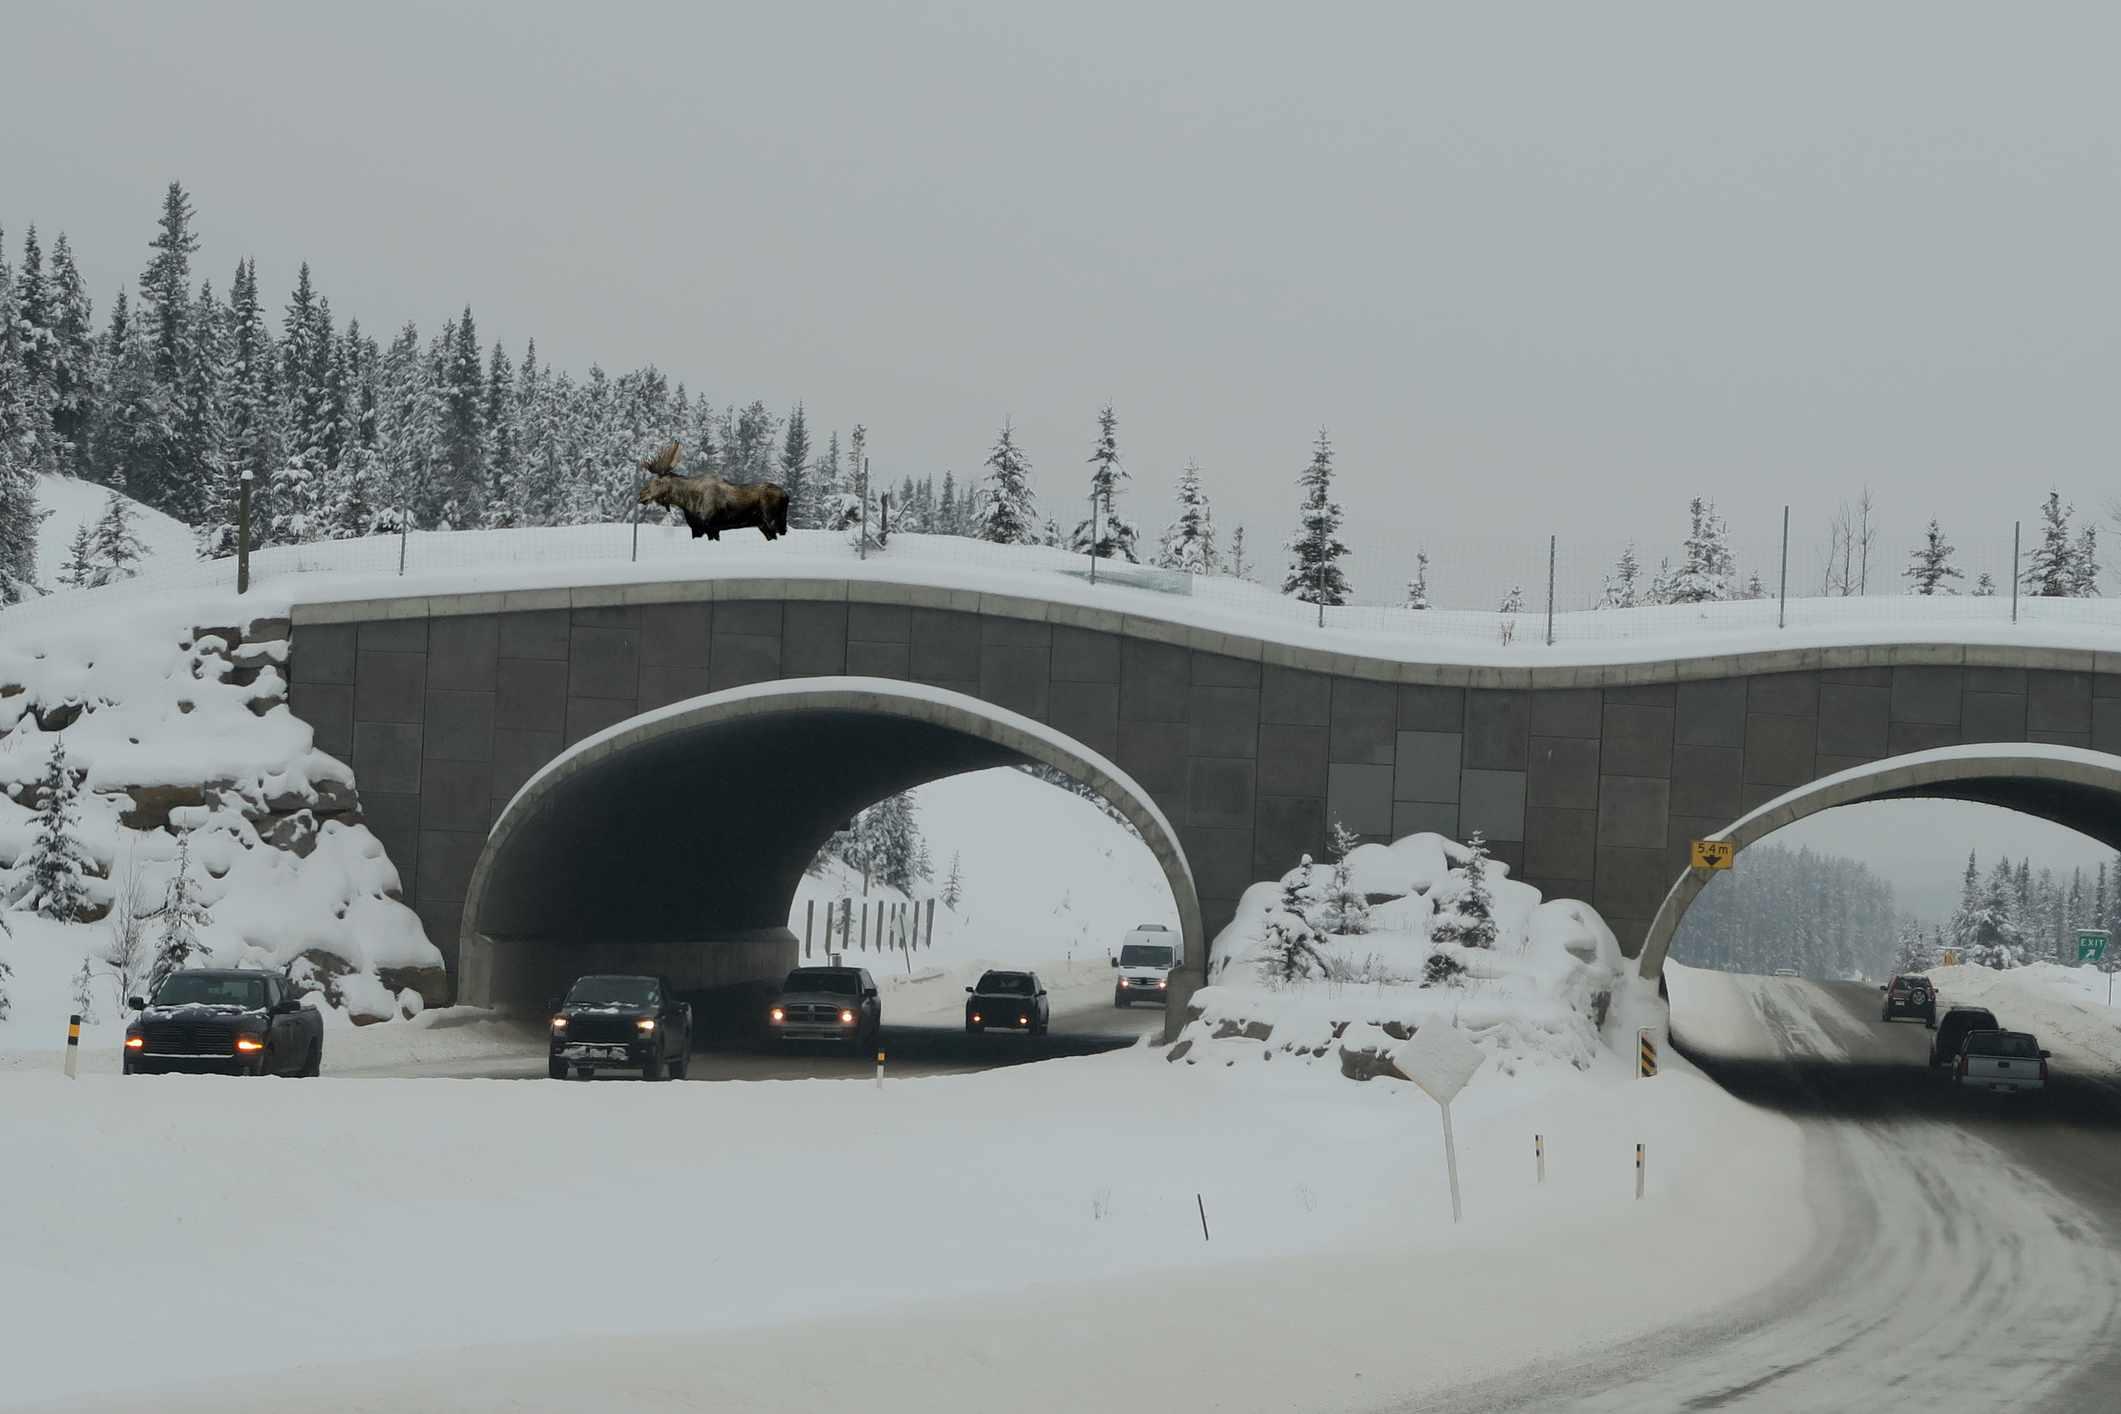 Moose crossing a wildlife bridge in Banff National Park